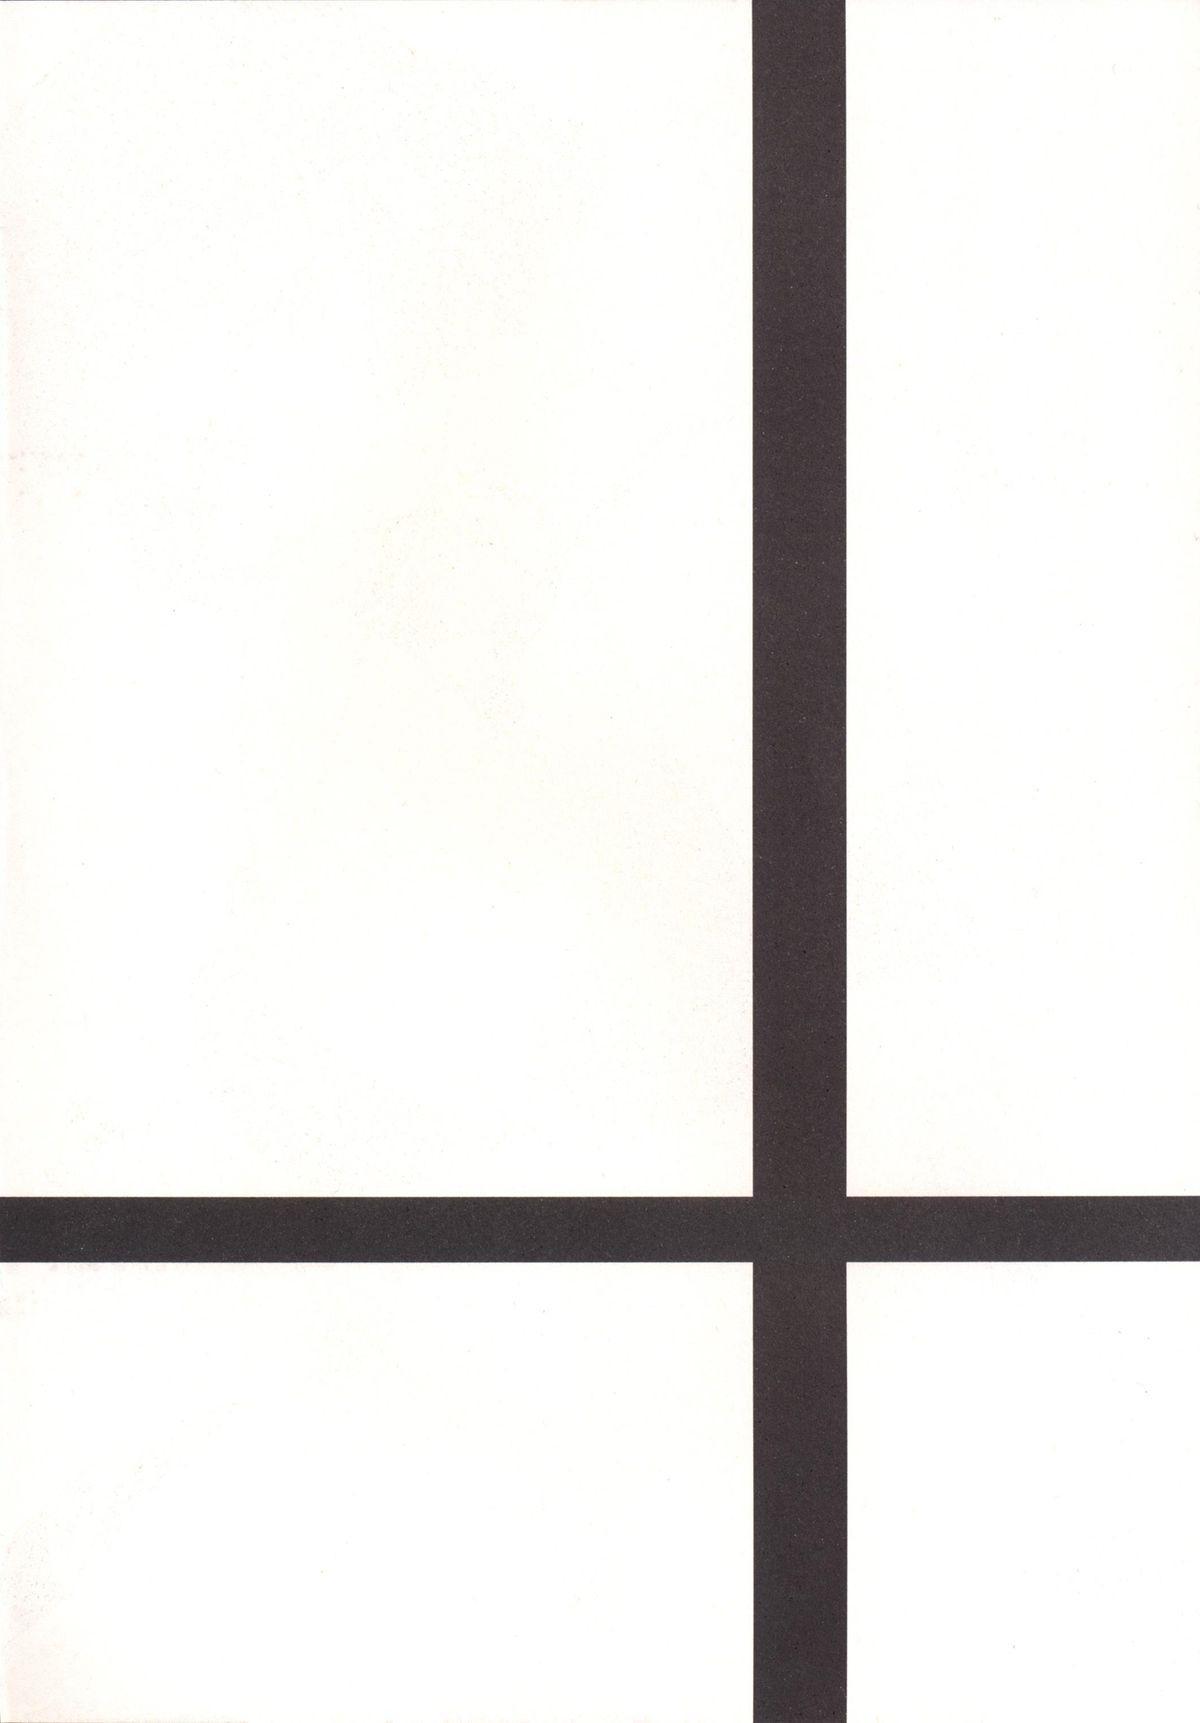 [Bronco Hitoritabi (Uchi-Uchi Keyaki)] Ishin Denshin Myoukou-san no Koibito | From Heart to Heart - Myoukou san's Love (Kantai Collection -KanColle-) [English] [Bigbigfool] [Digital] [Incomplete] 2